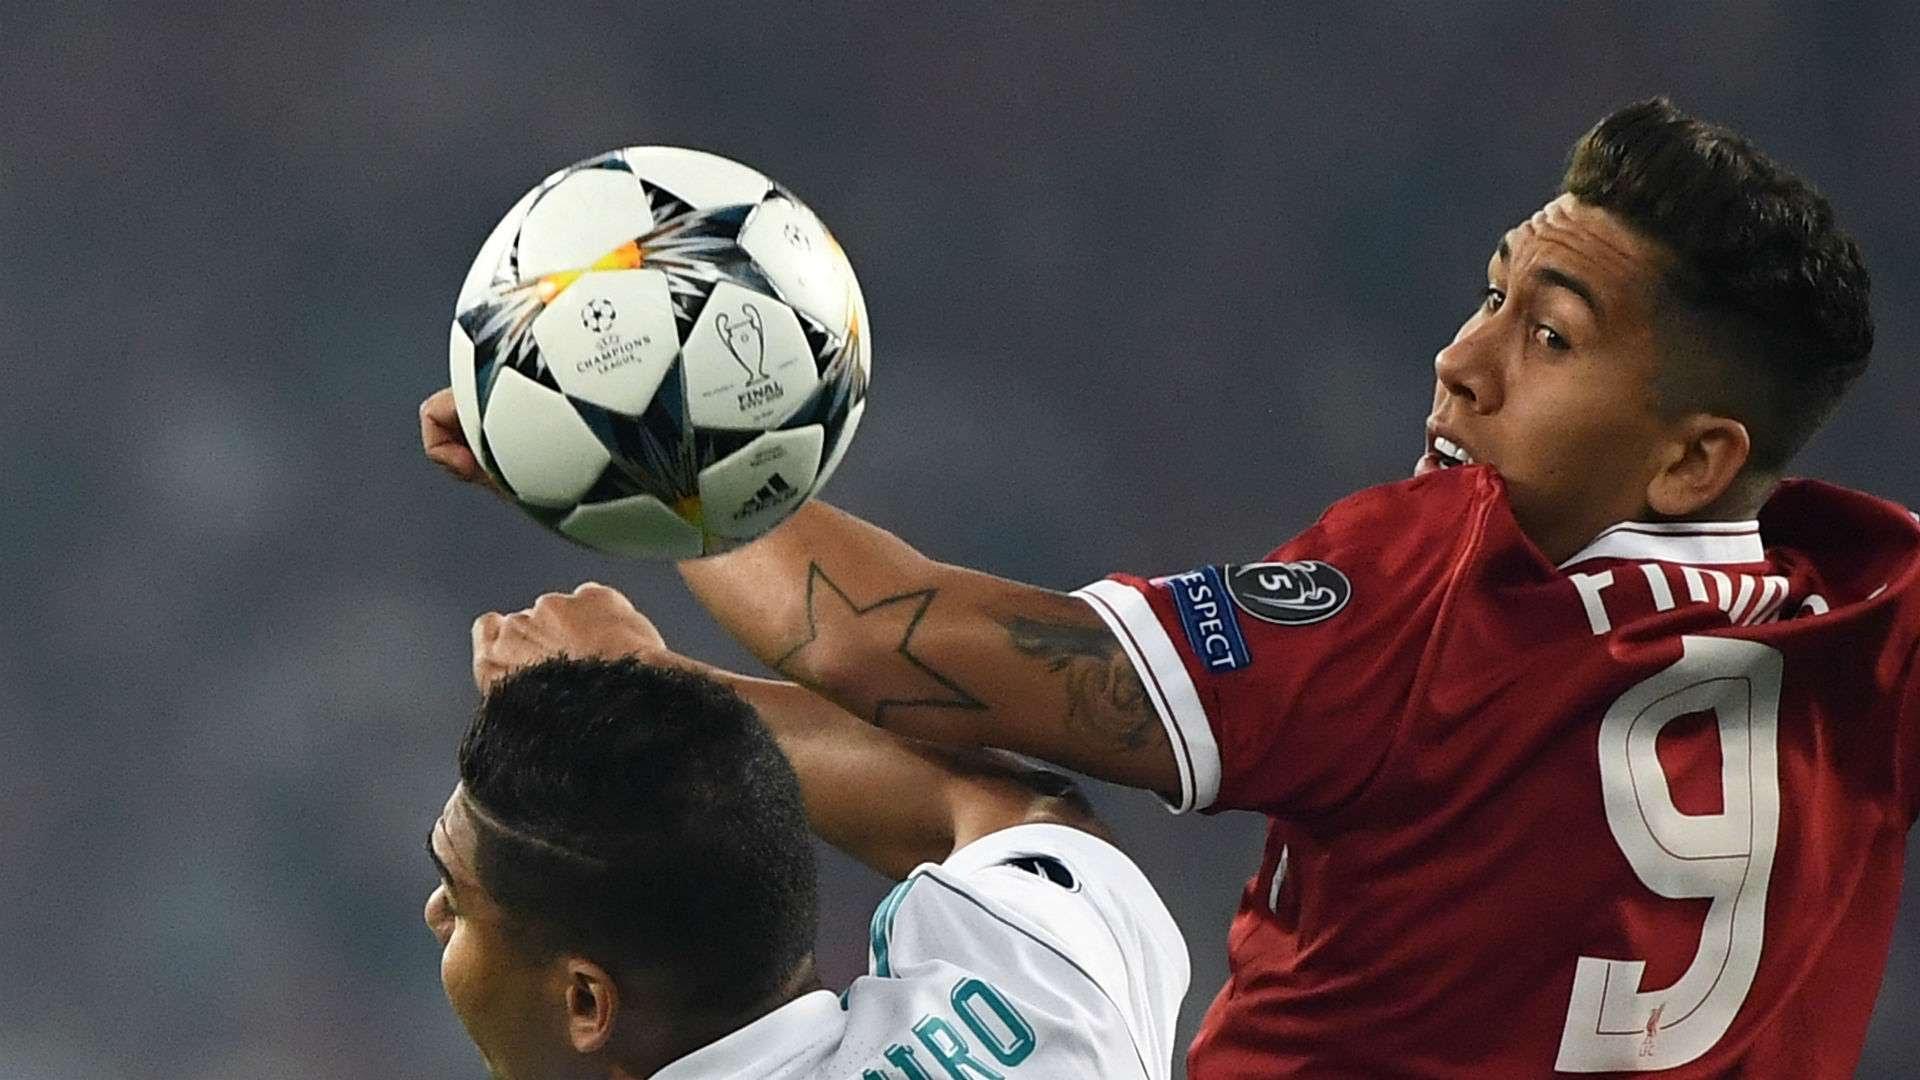 Champions League ball Adidas Finale 17 final